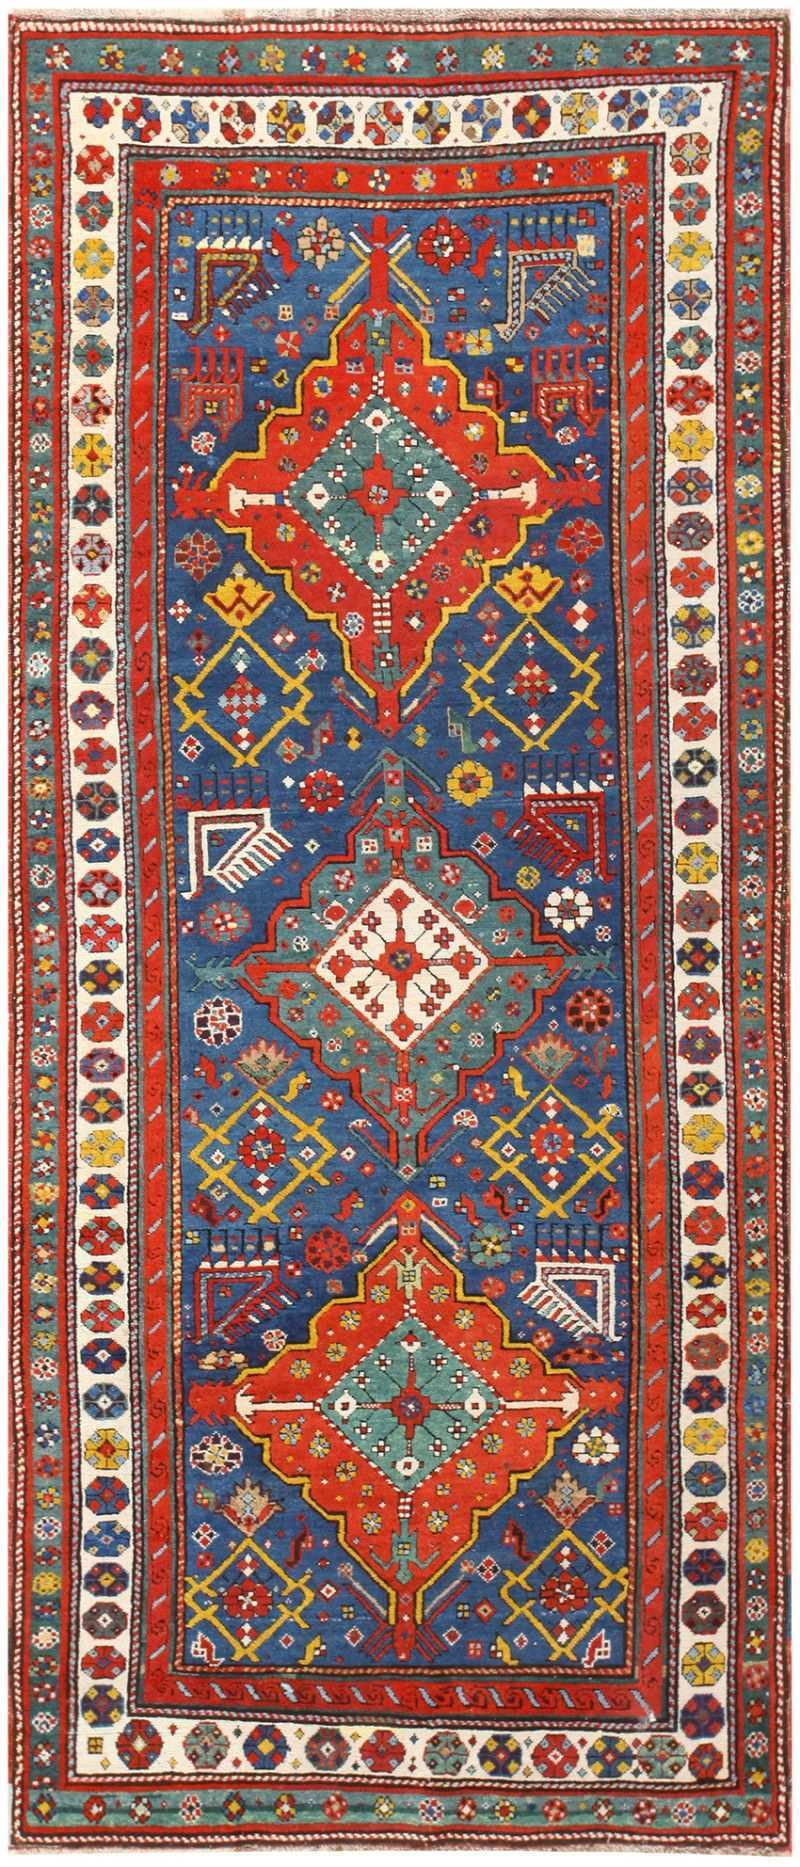 Antique Geometric Caucasian Talish Rug Runner 48462 Nazmiyal Rugs Rugs Rugs On Carpet Carpet Fabric